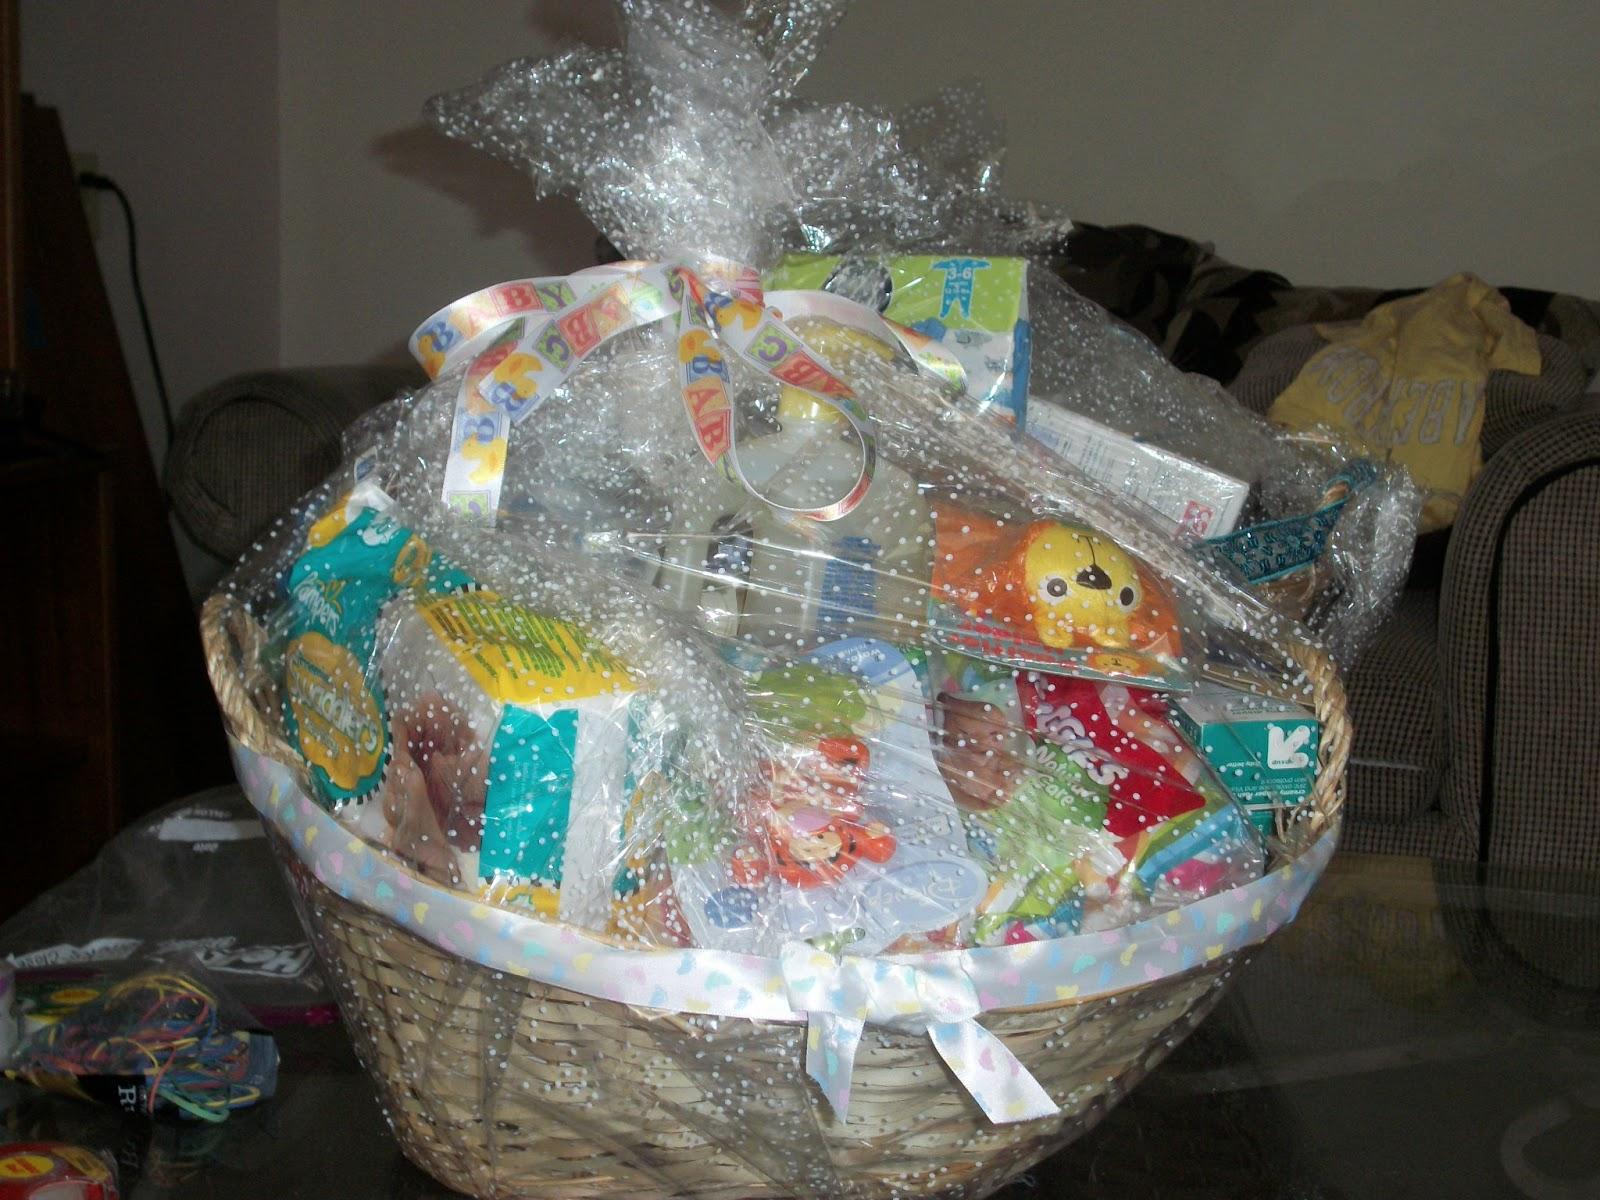 Baby Gift Baskets To Make : Lalita s amazing baskets c